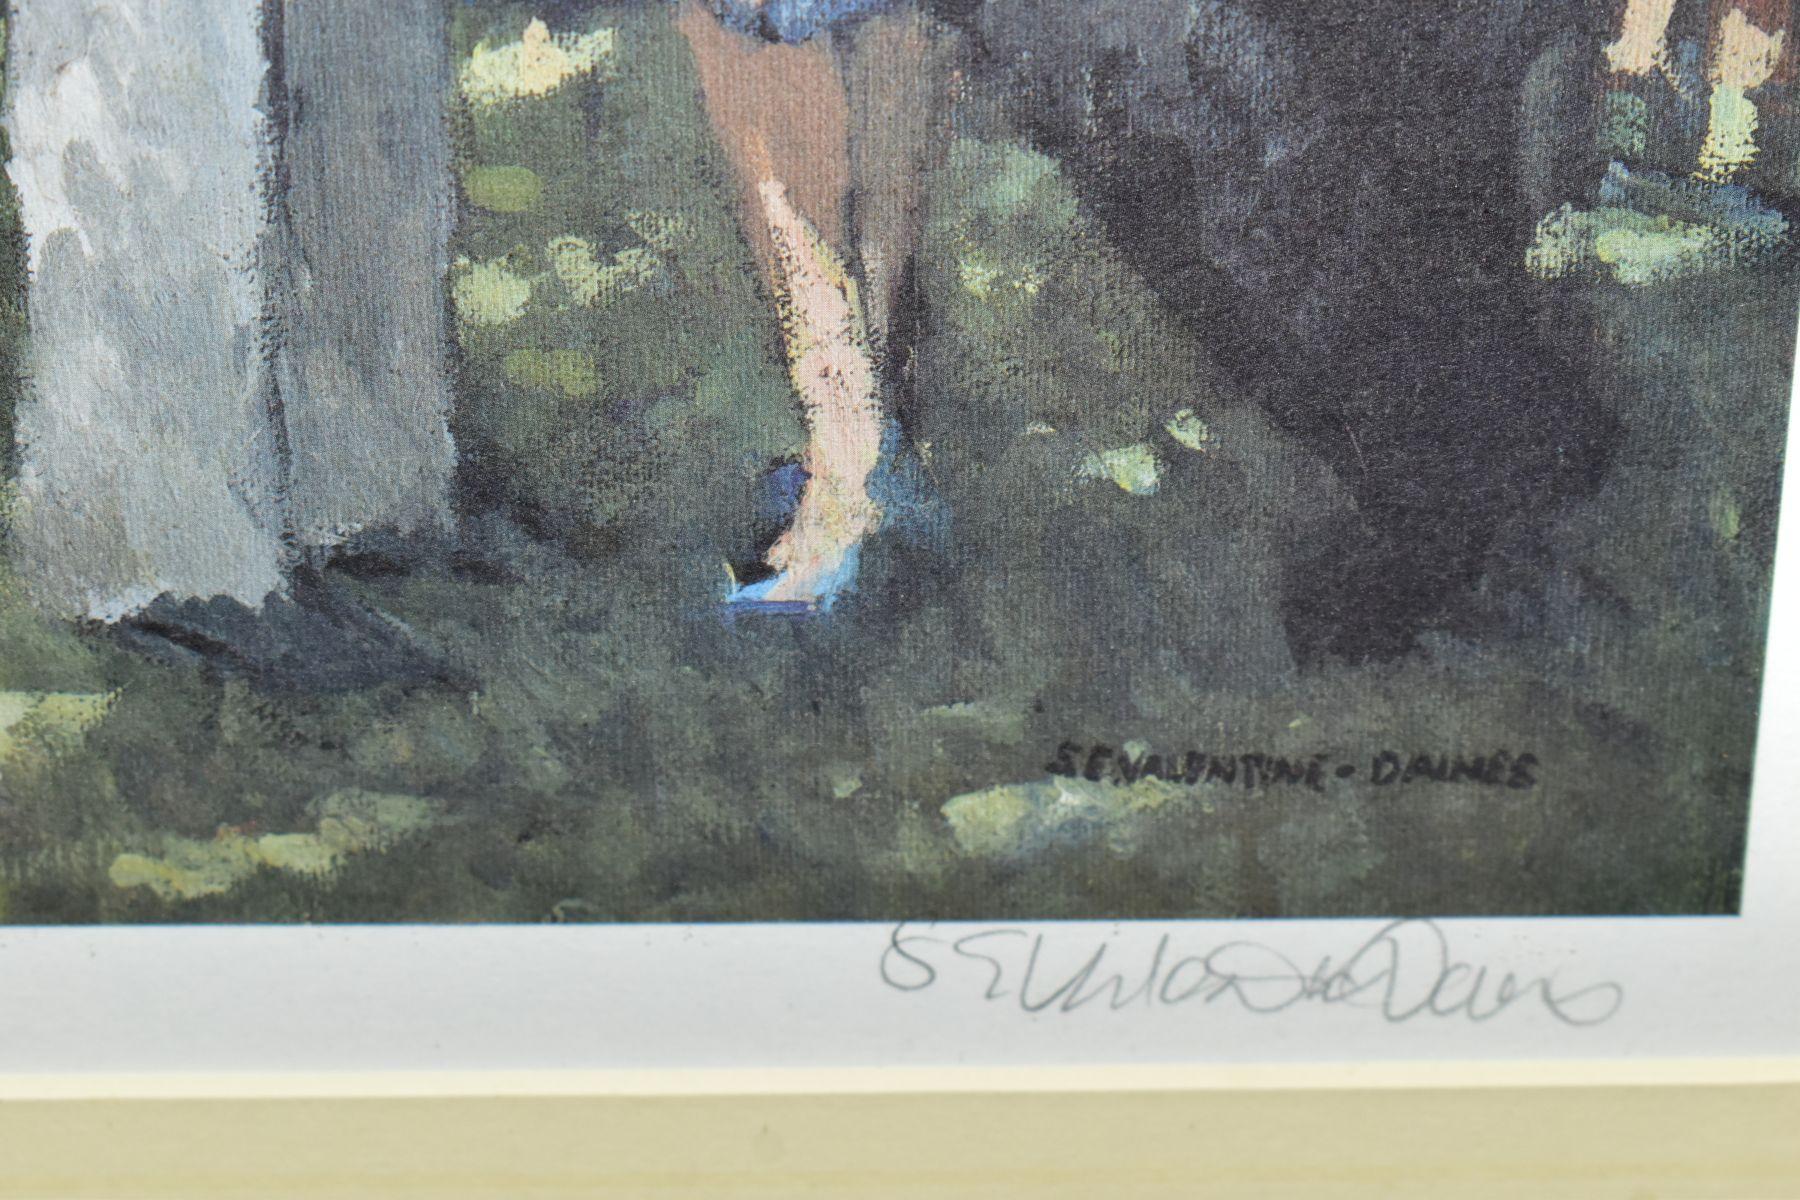 SHERREE VALENTINE DAINES (BRITISH 1959) 'HIGH SOCIETY' a limited edition print of Henley Regatta, - Image 3 of 3